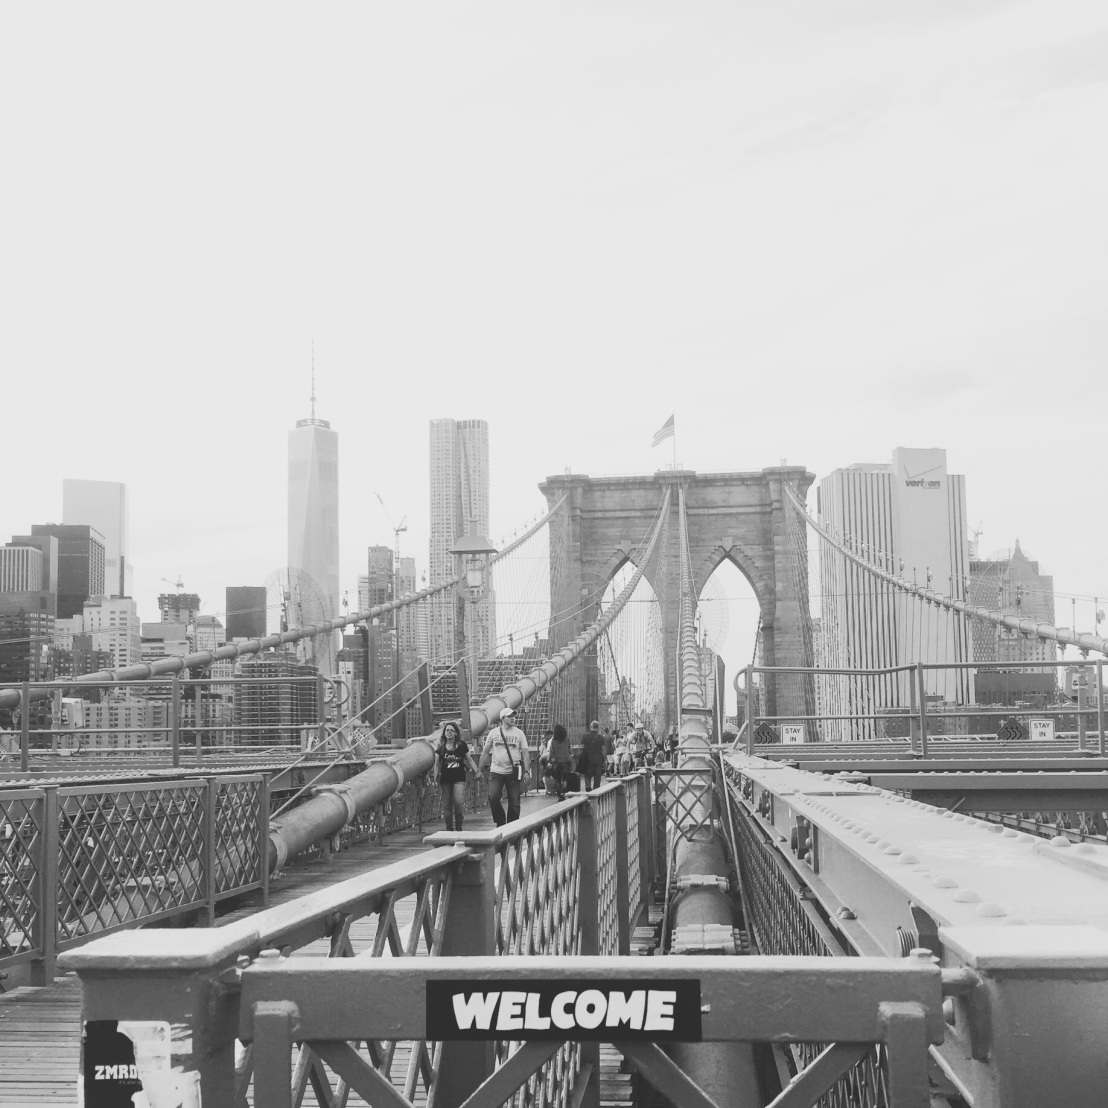 NYC, initial musings